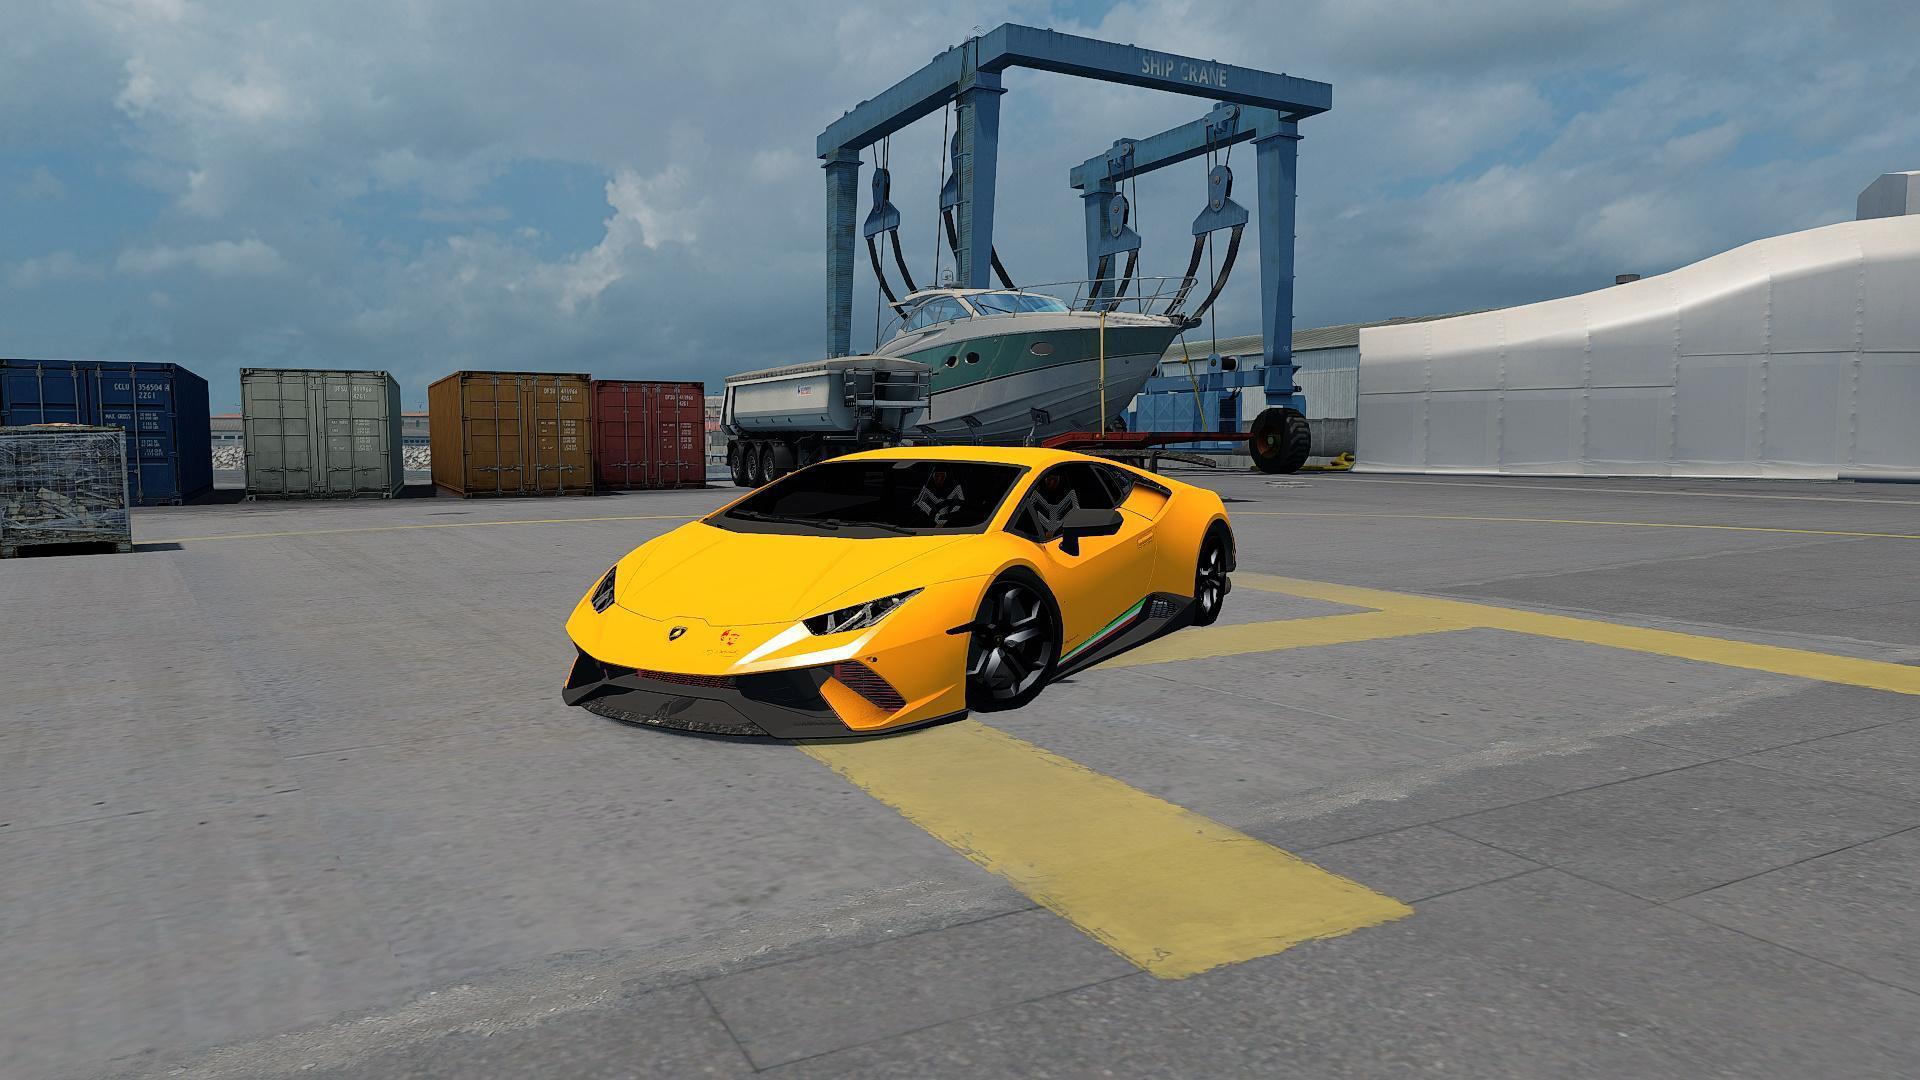 Lamborghini » GamesMods net - FS19, FS17, ETS 2 mods